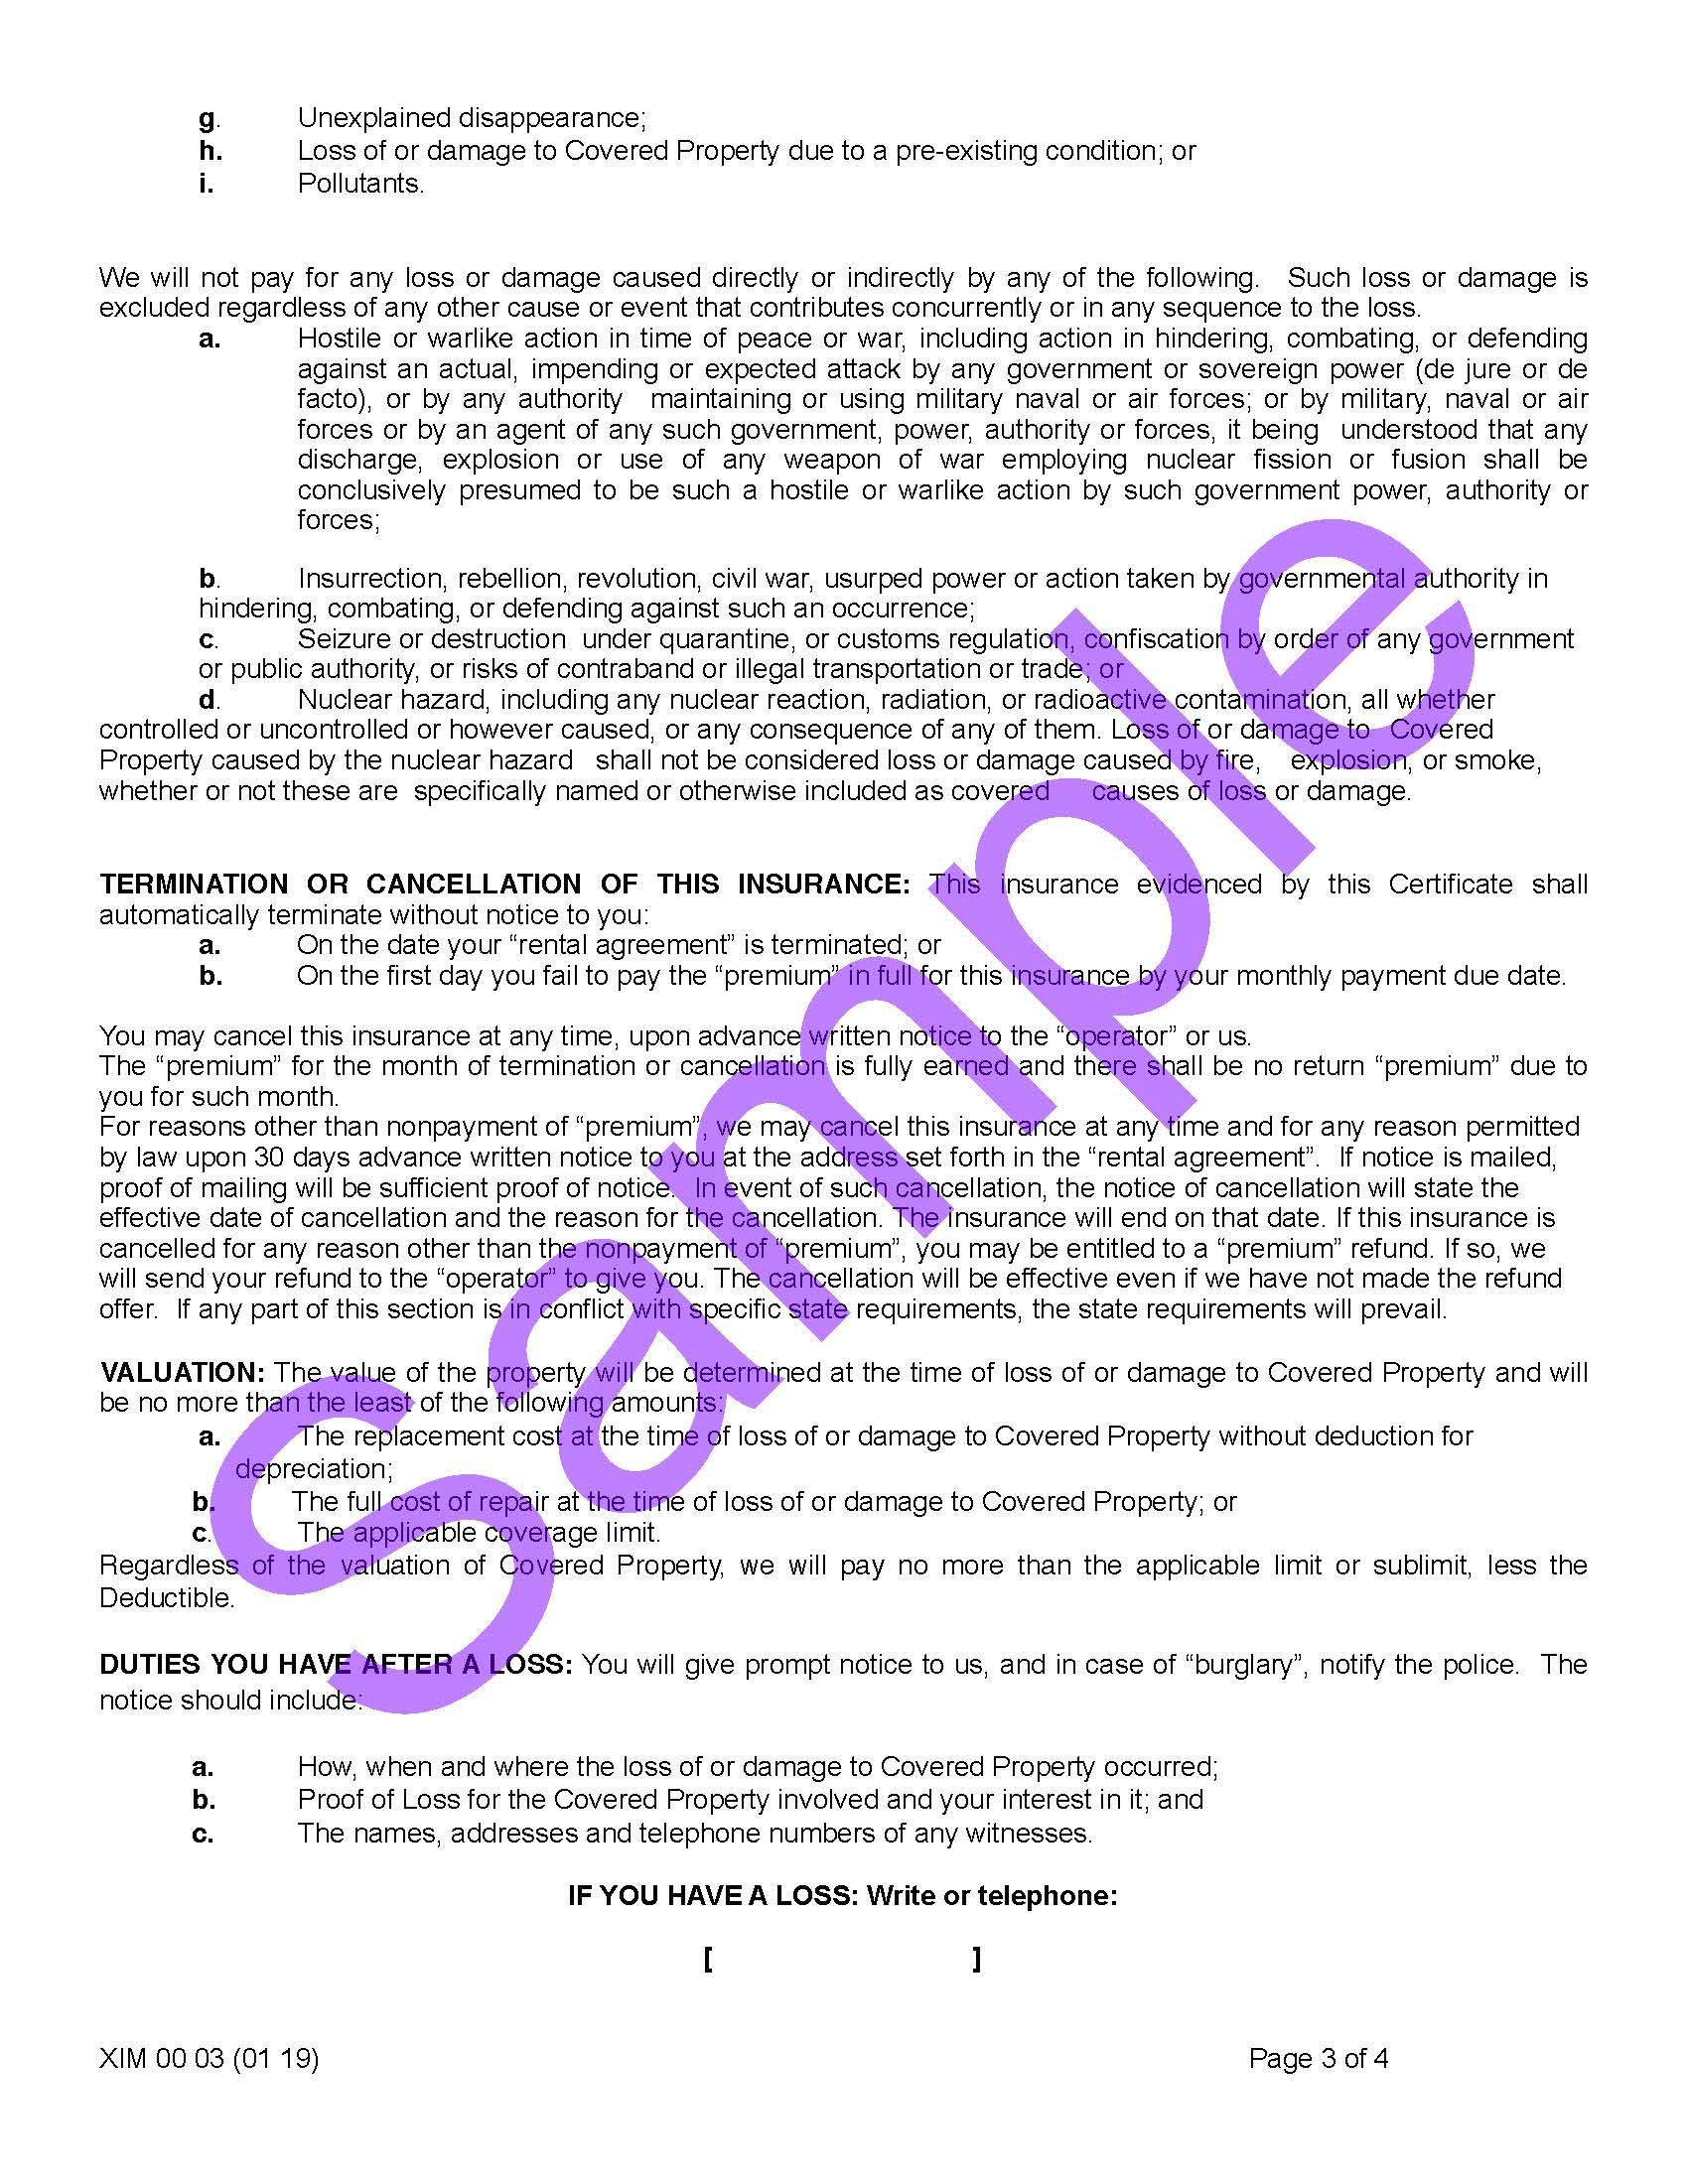 CW XIM 00 03 (01-19) Certificate of InsuranceSample_Page_3.jpg